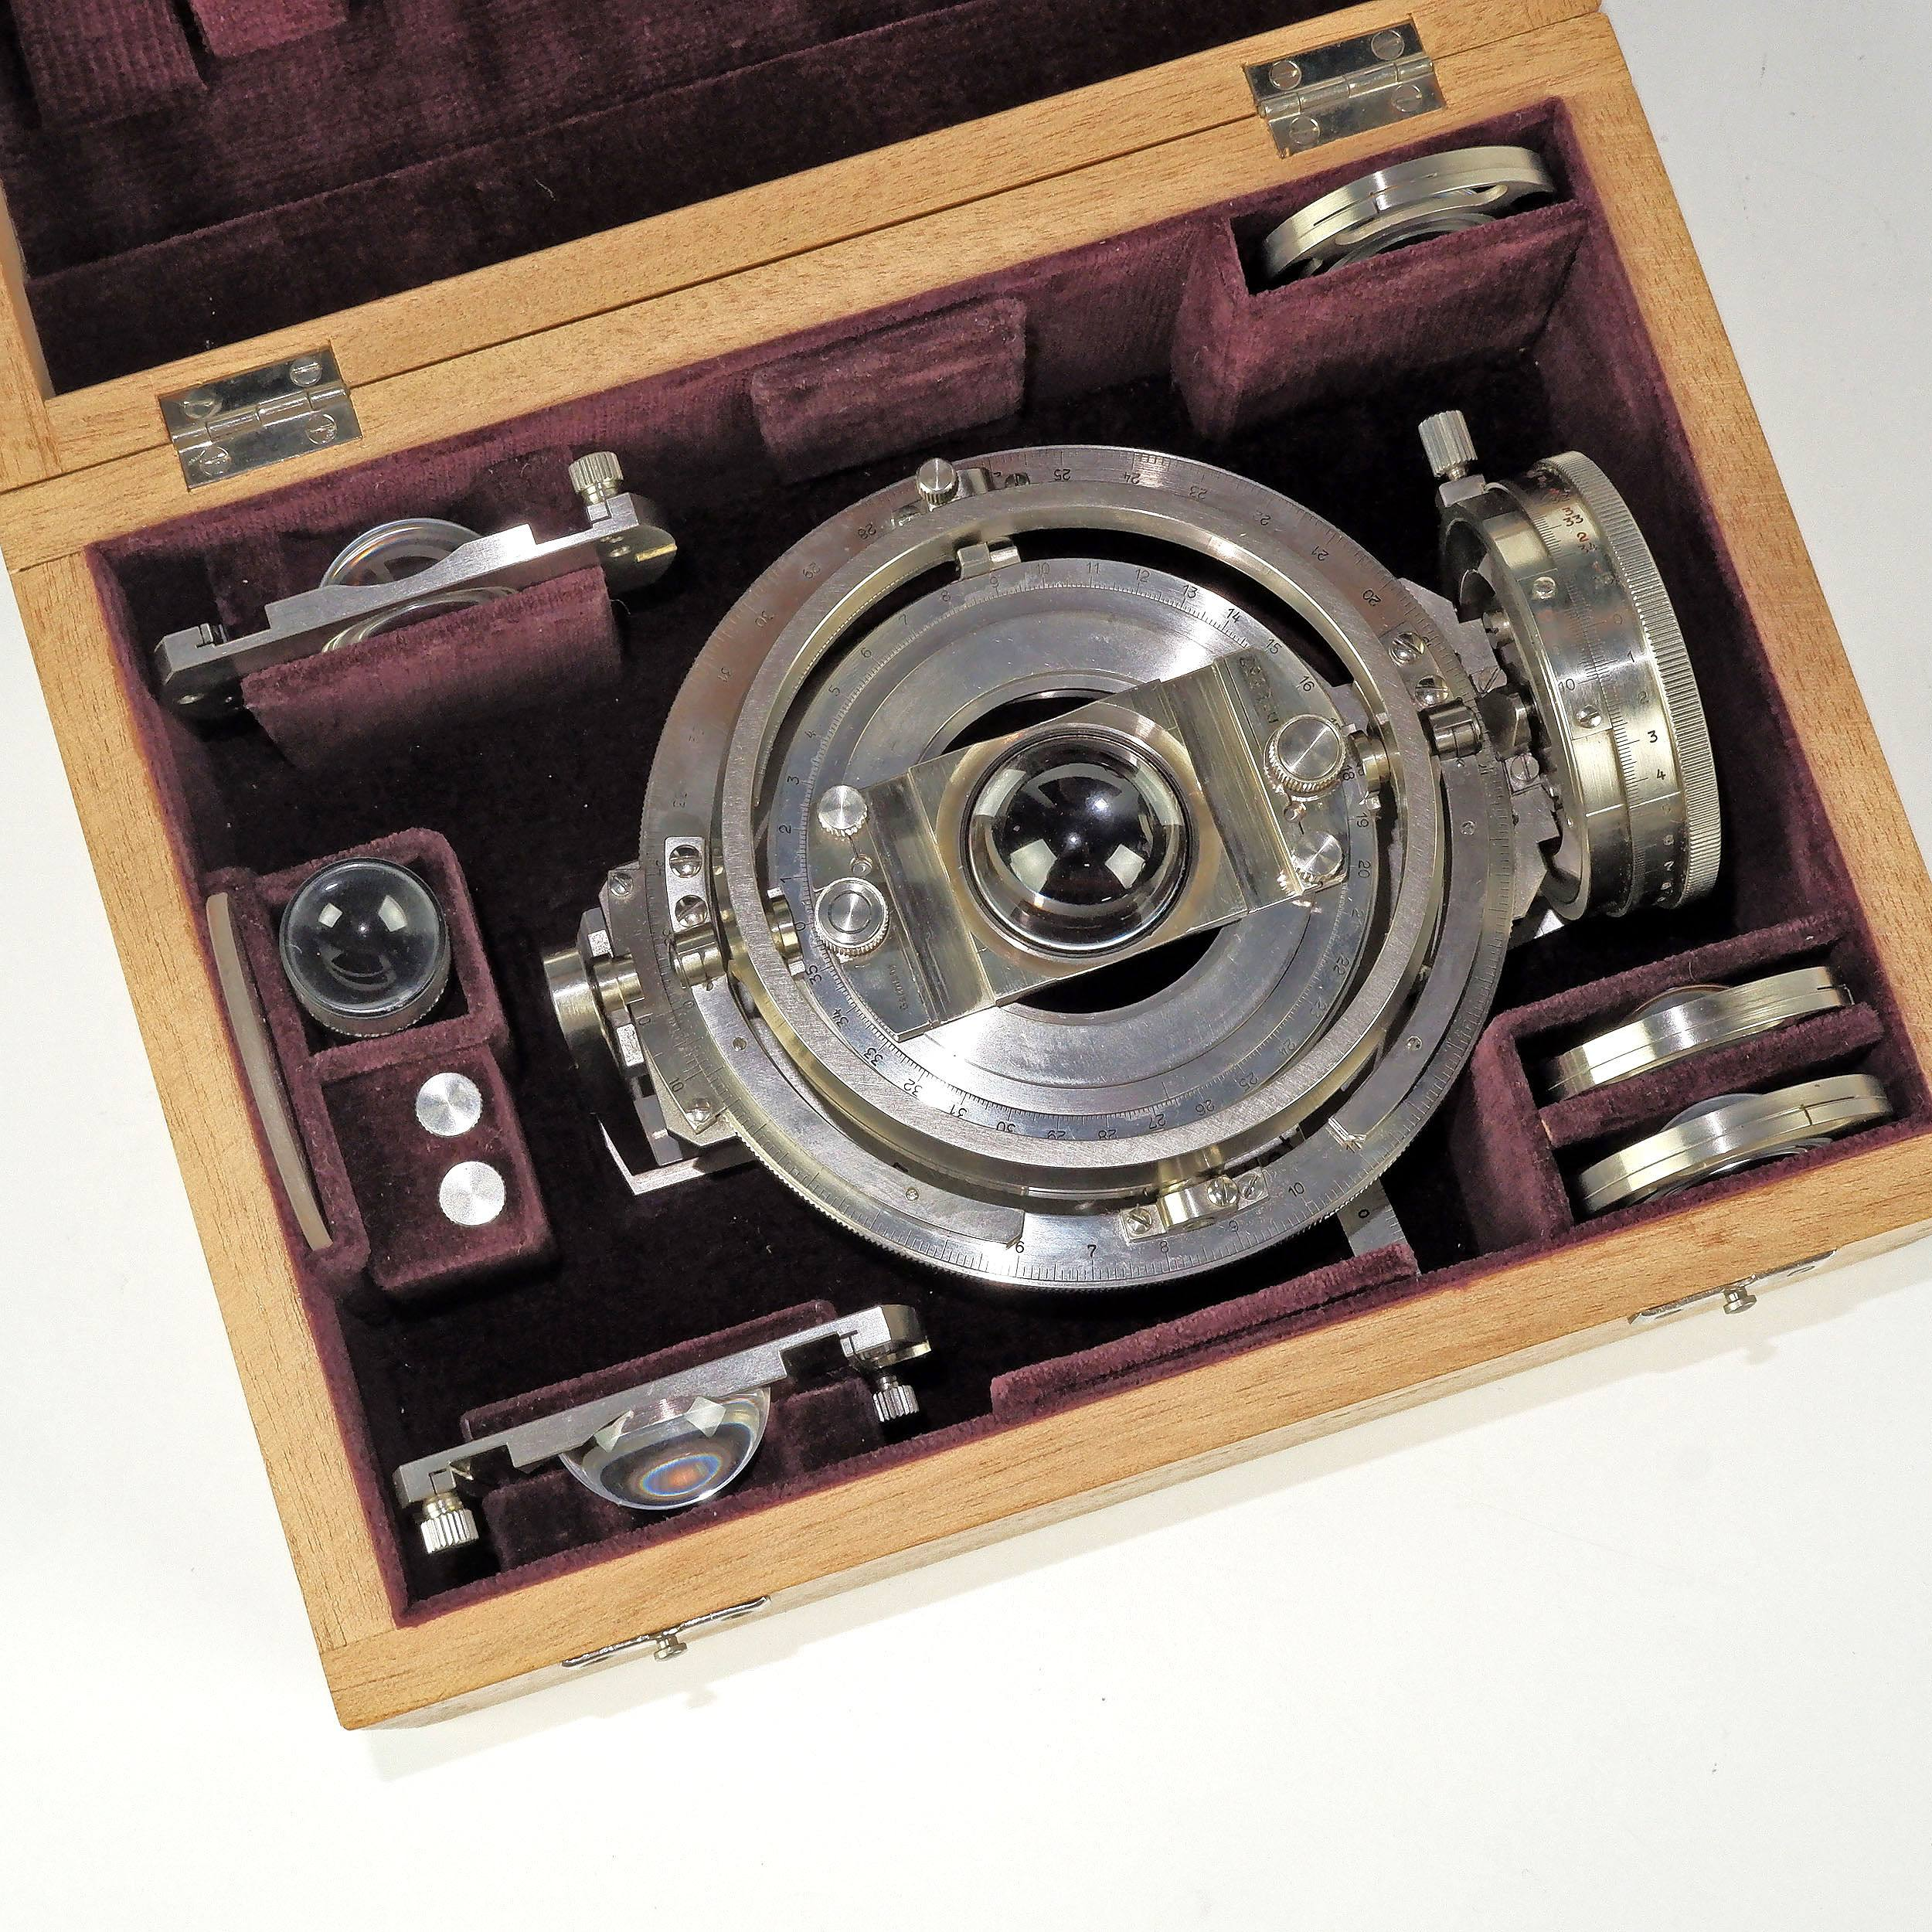 'Rare Leitz Wetzlar Universal Gimbal Microscope Stage'